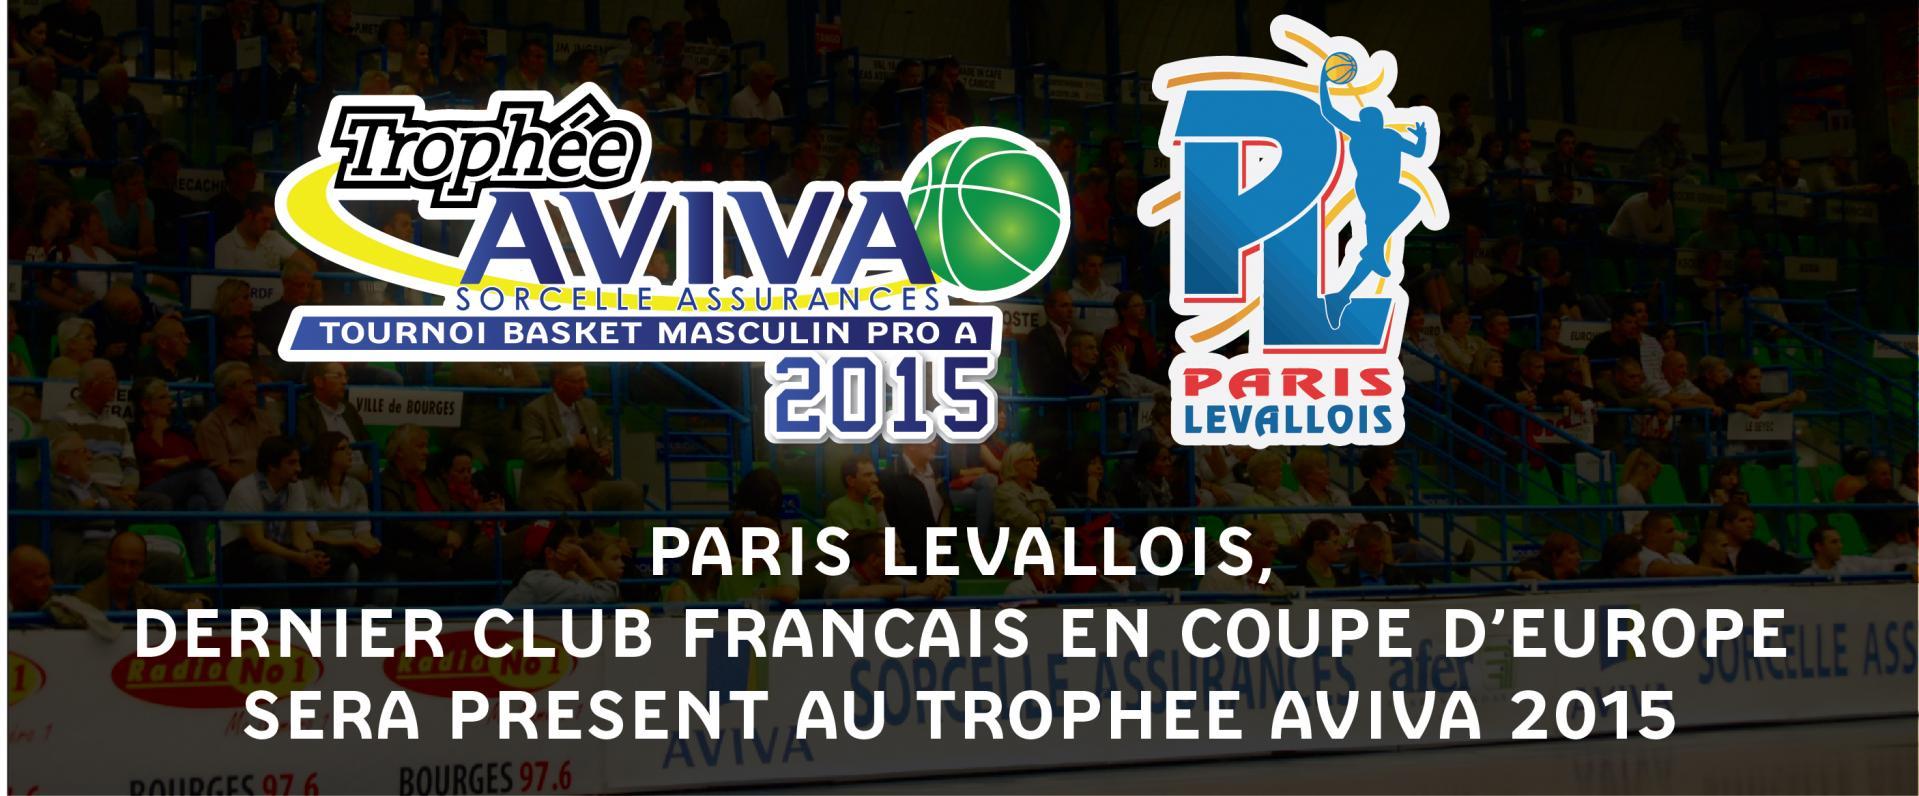 Trophée Aviva 2015